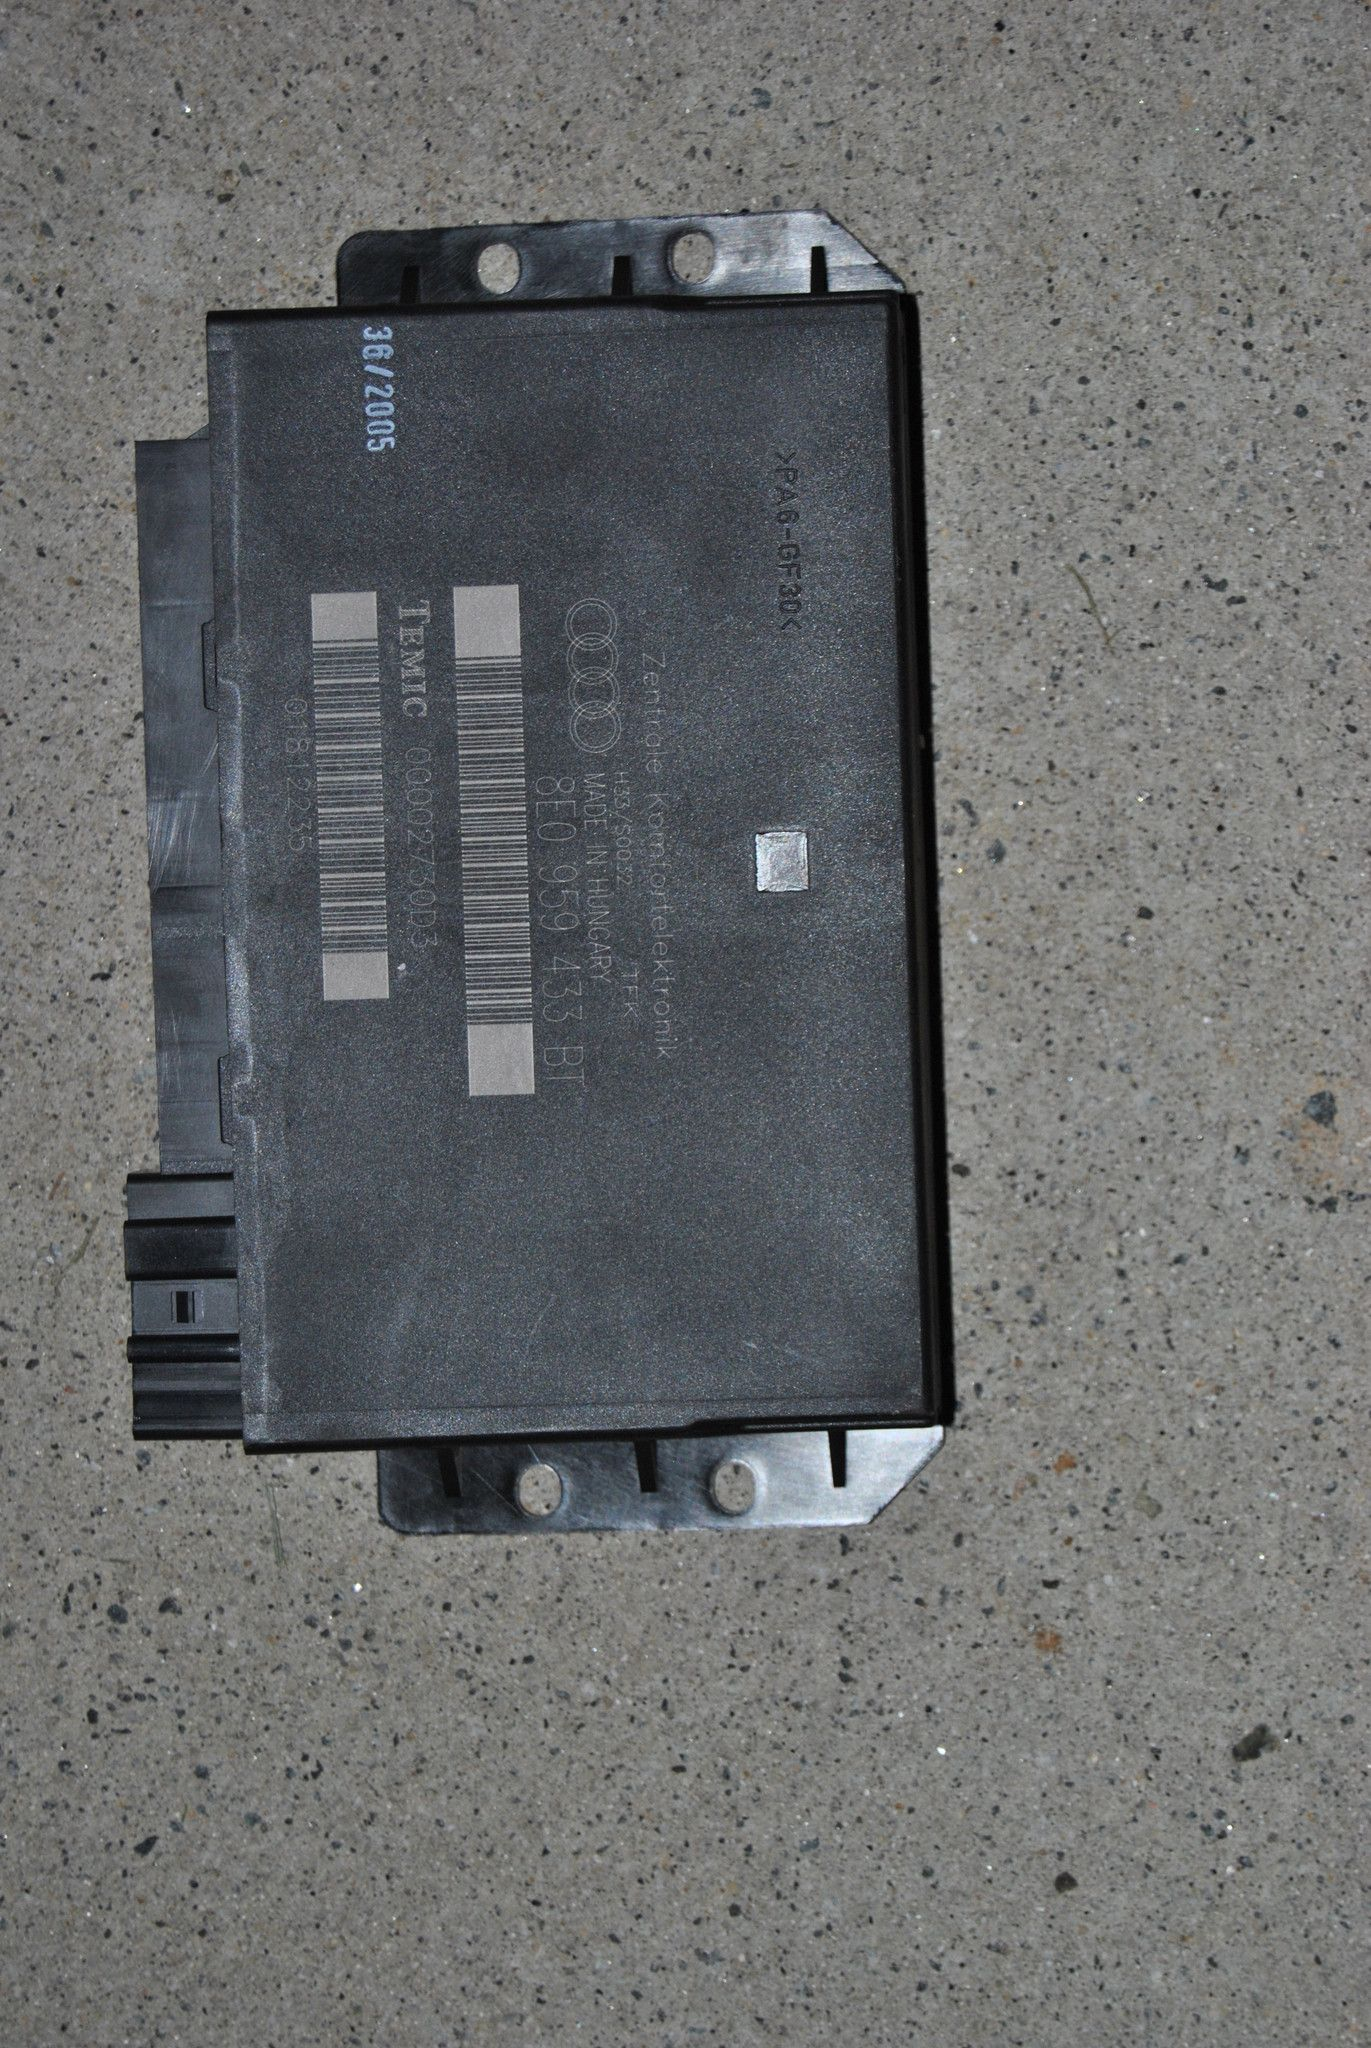 05 06 07 08 Audi A4 Ccm Comfort Control Module 8e0959433bt